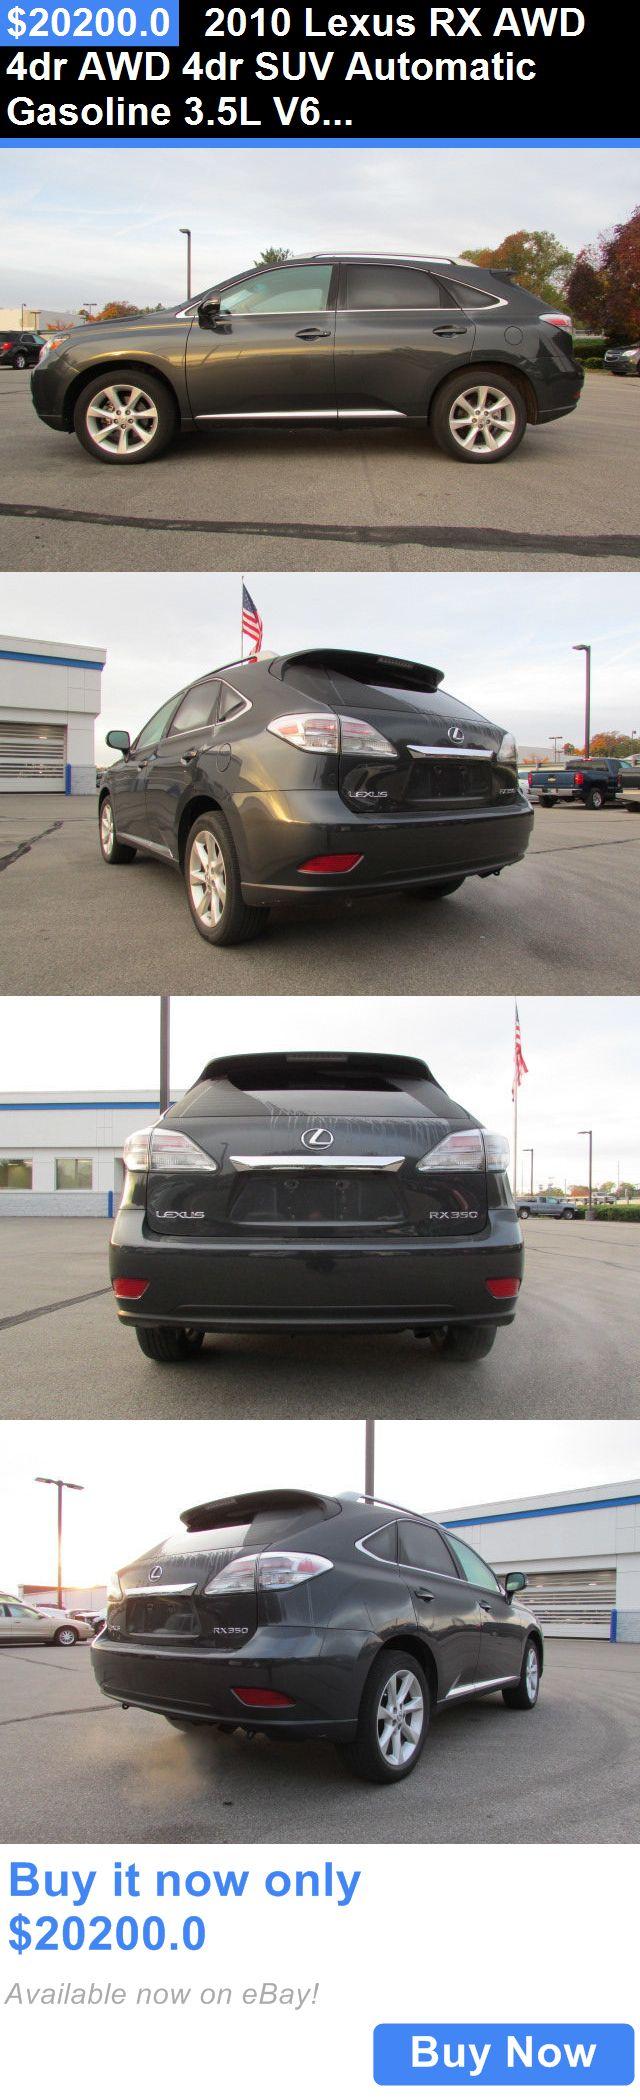 SUVs: 2010 Lexus Rx Awd 4Dr Awd 4Dr Suv Automatic Gasoline 3.5L V6 Cyl Grey BUY IT NOW ONLY: $20200.0